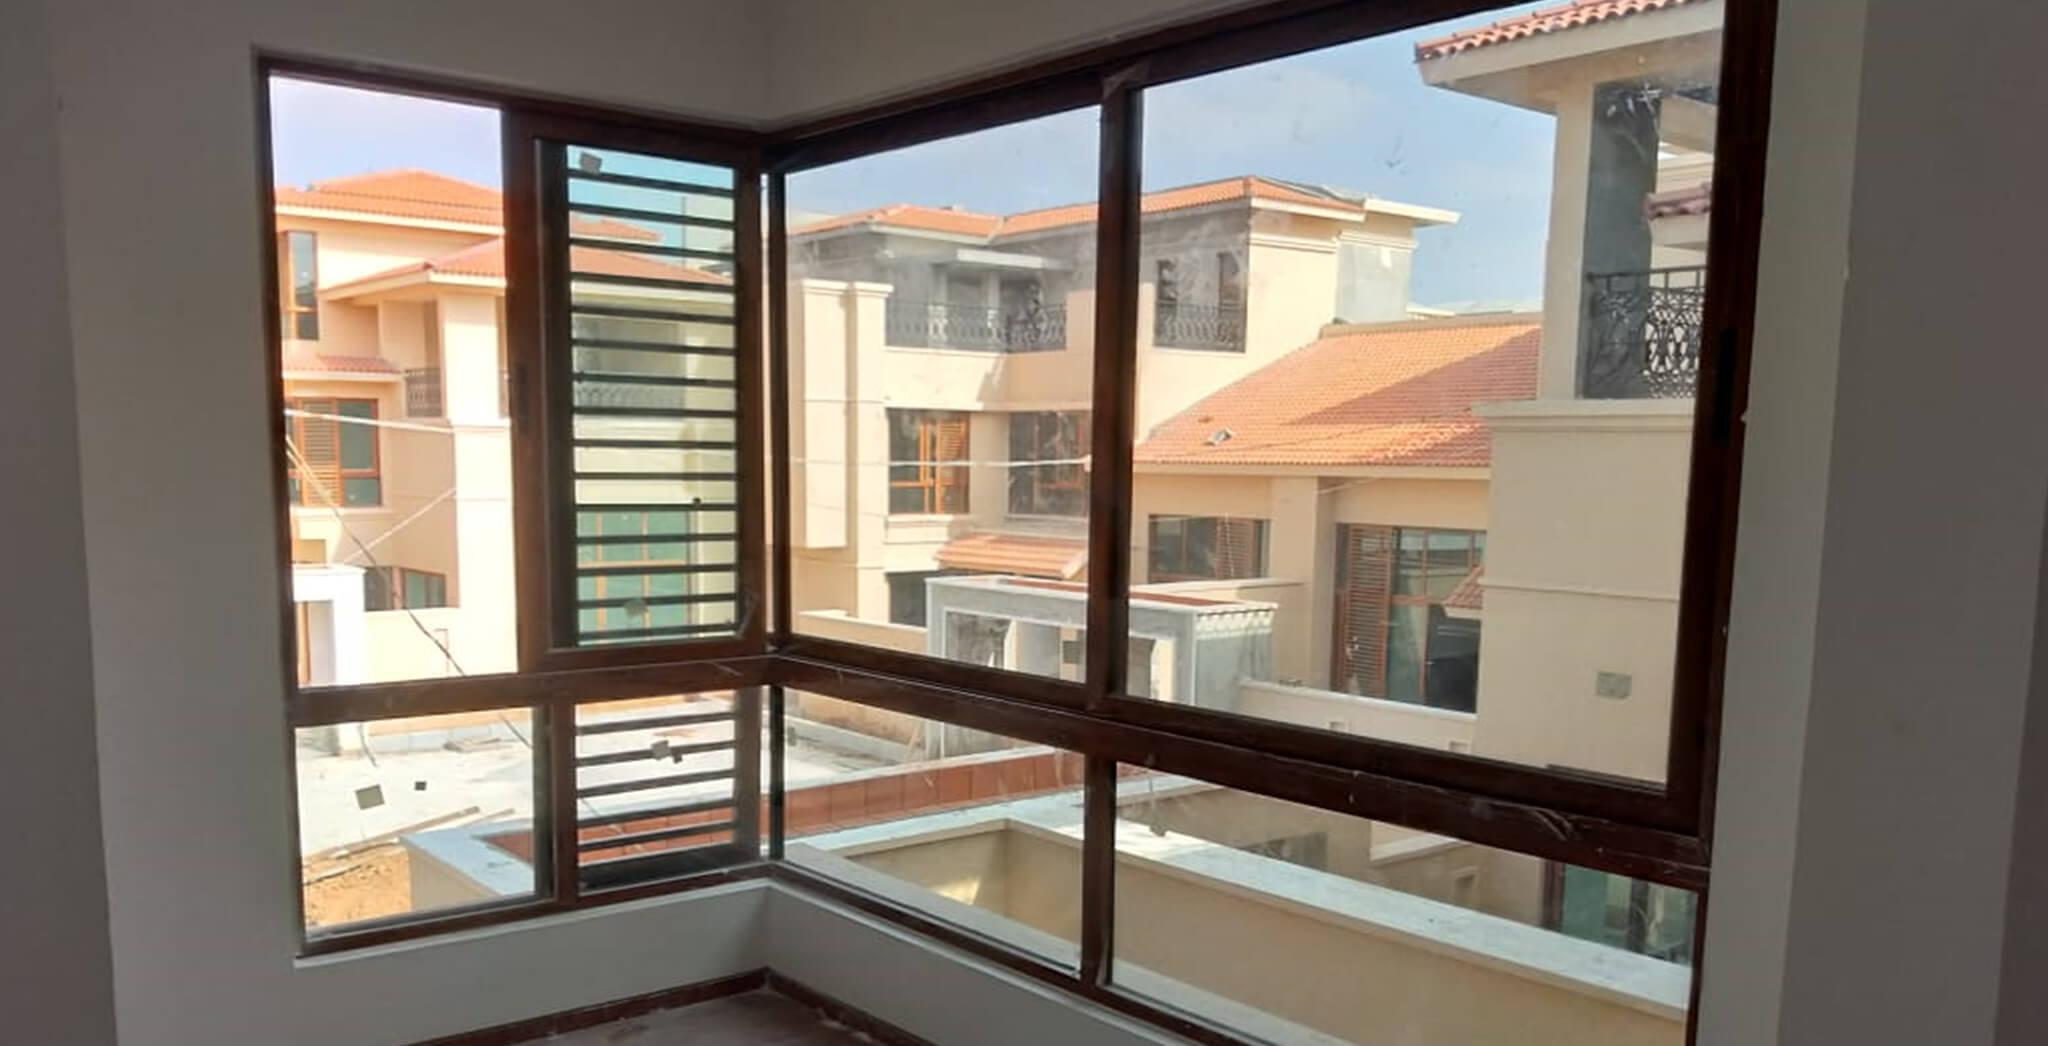 Nov 2018 - Villas window installation work-in-progress